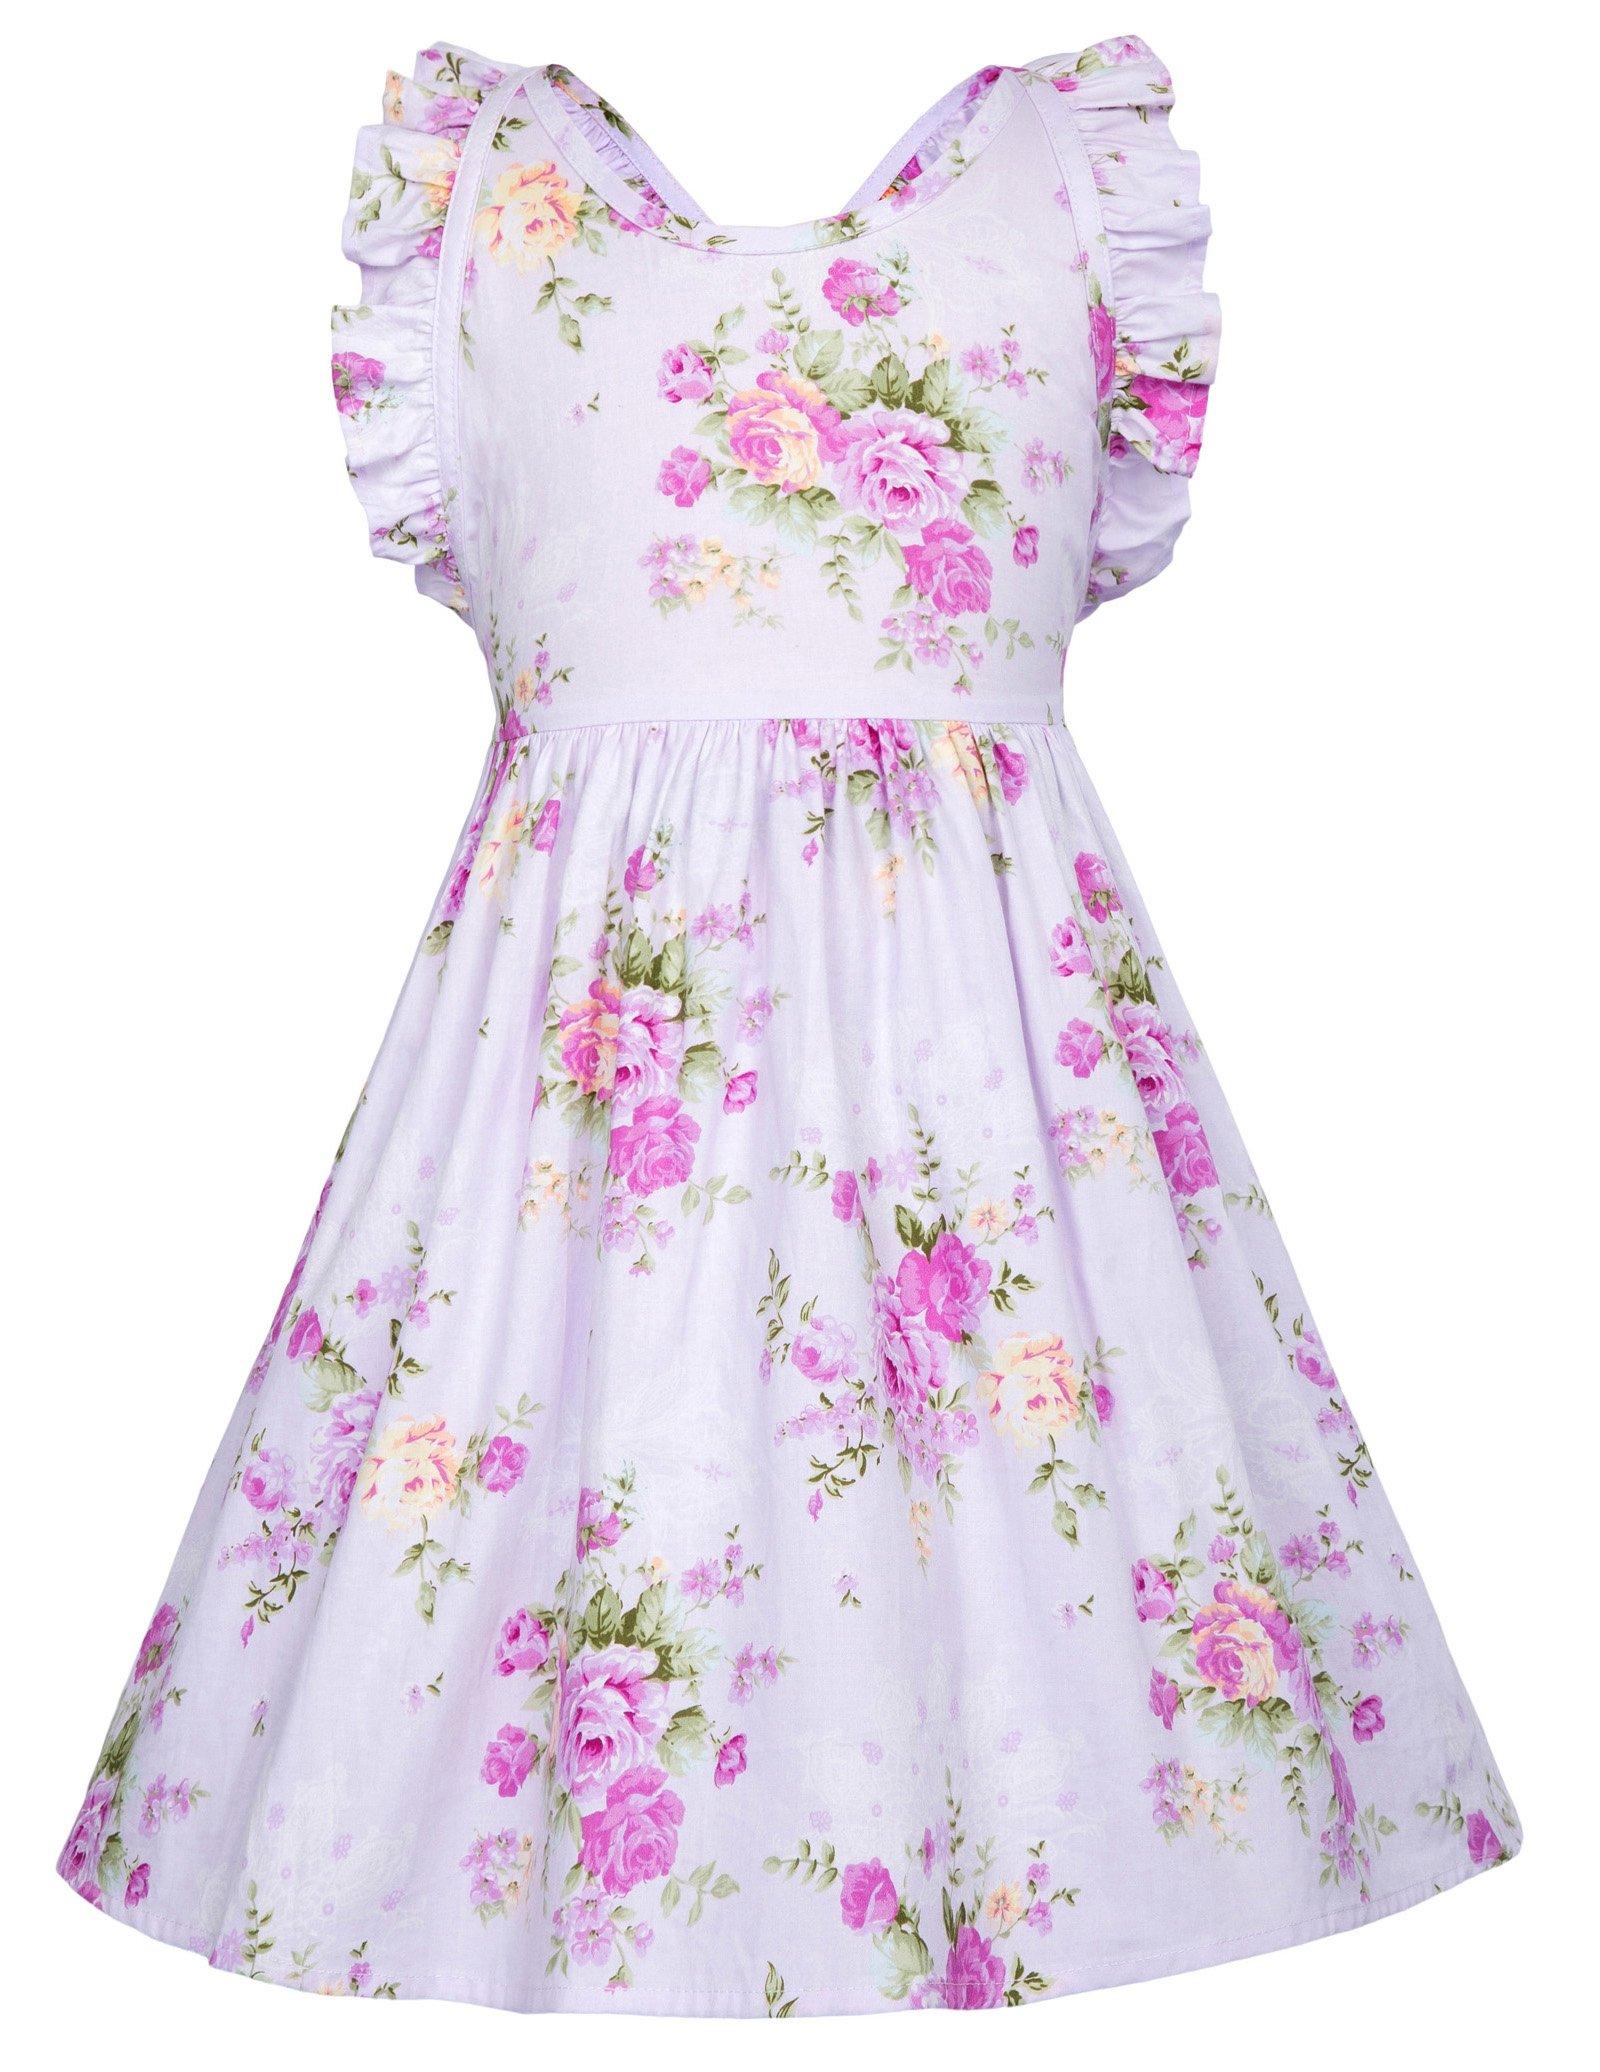 Party Pageant Unique Design Dresses for Little Girls 8-9yrs CL601-1